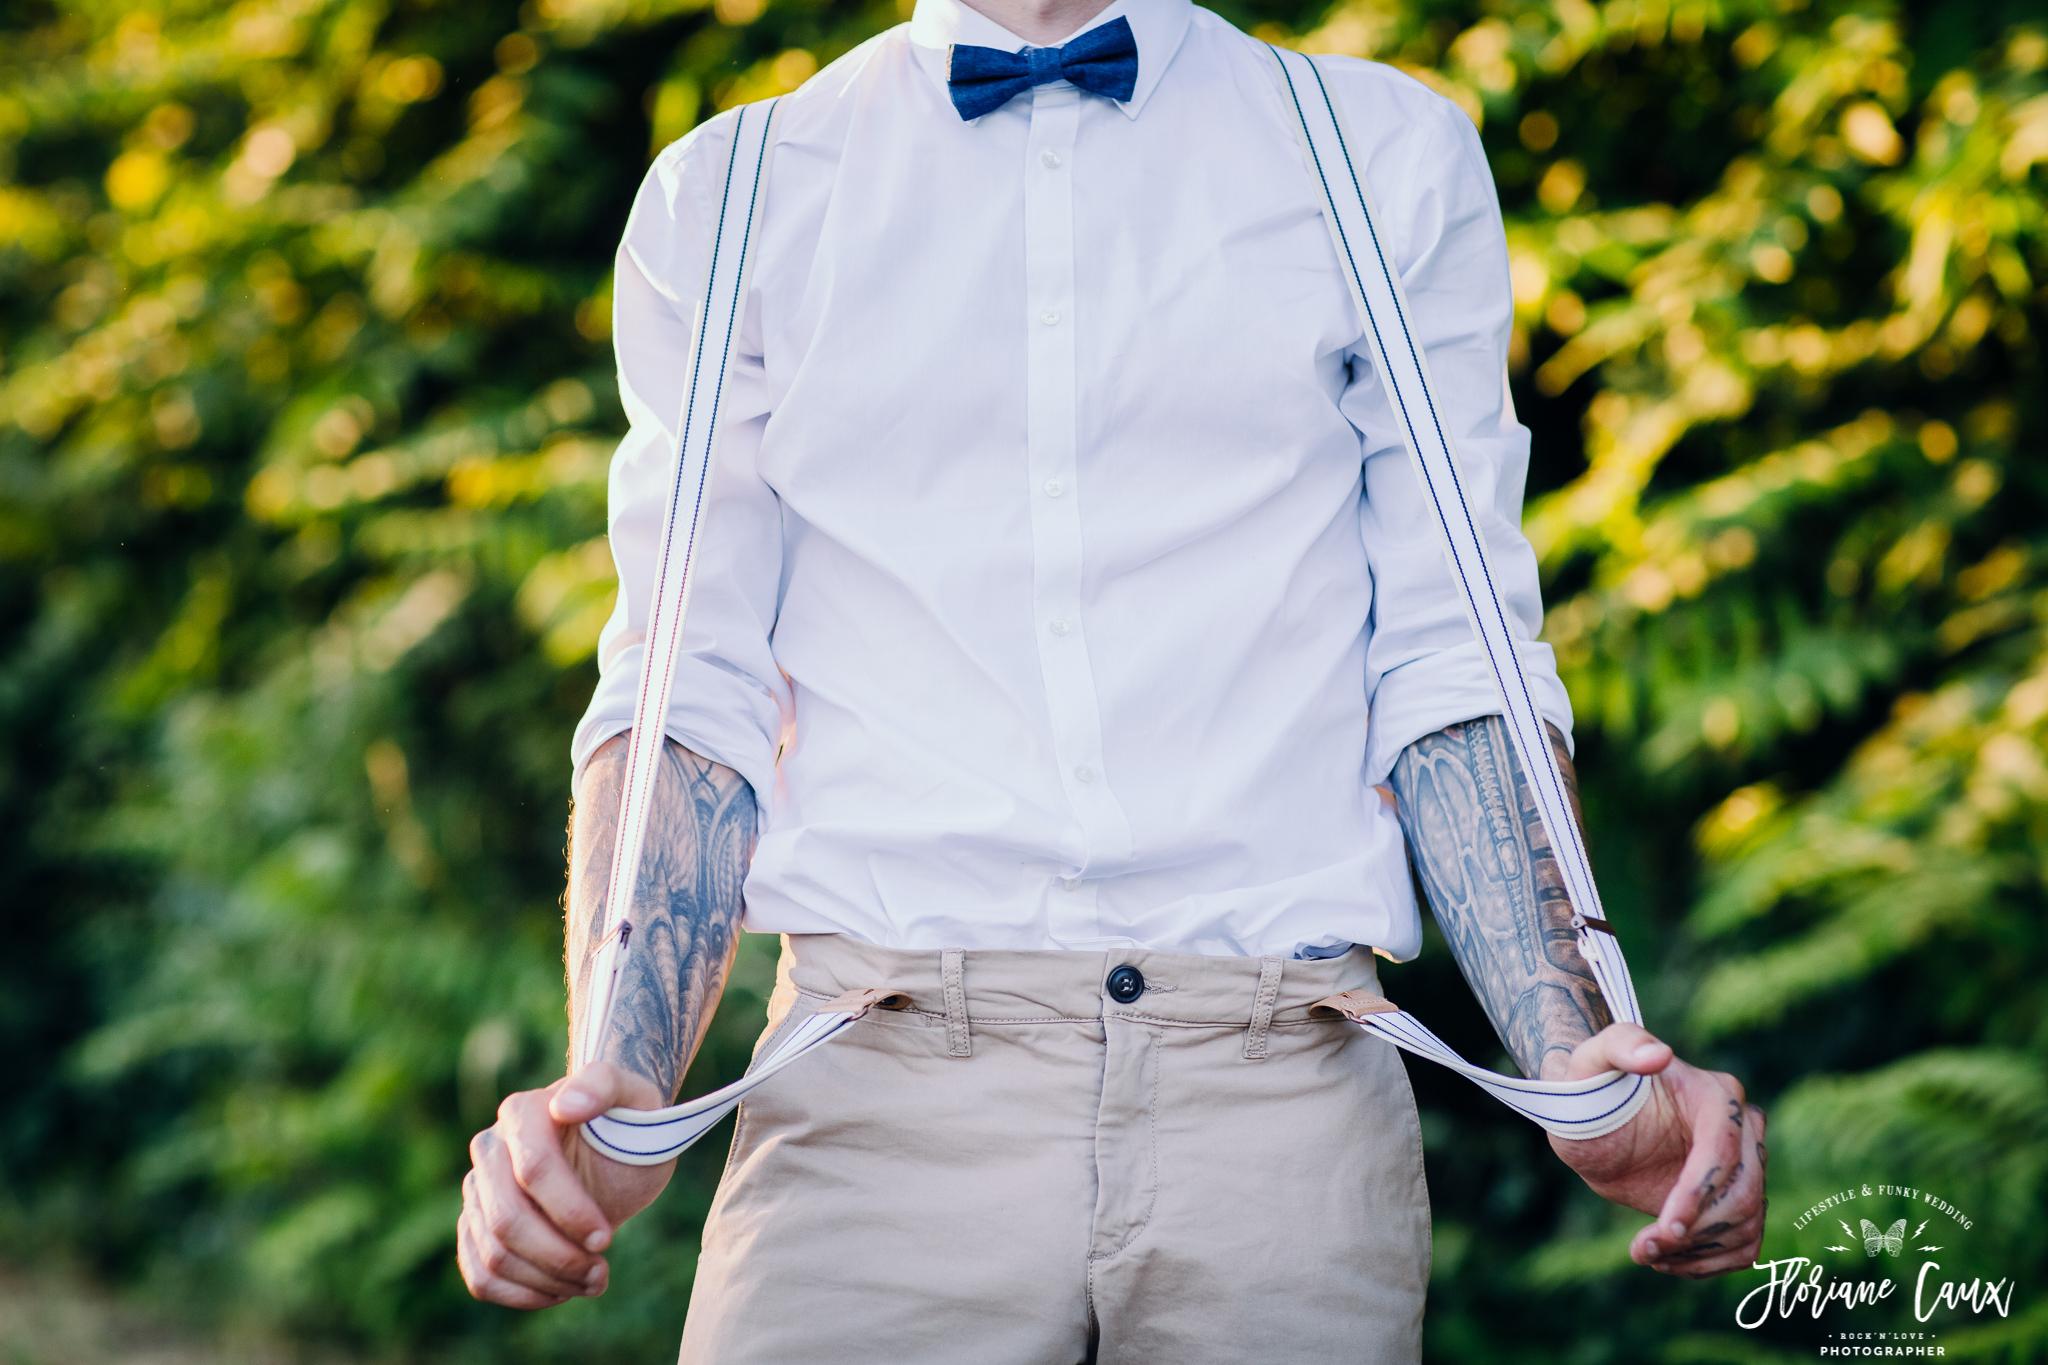 photographe-mariage-toulouse-rocknroll-maries-tatoues-floriane-caux-82